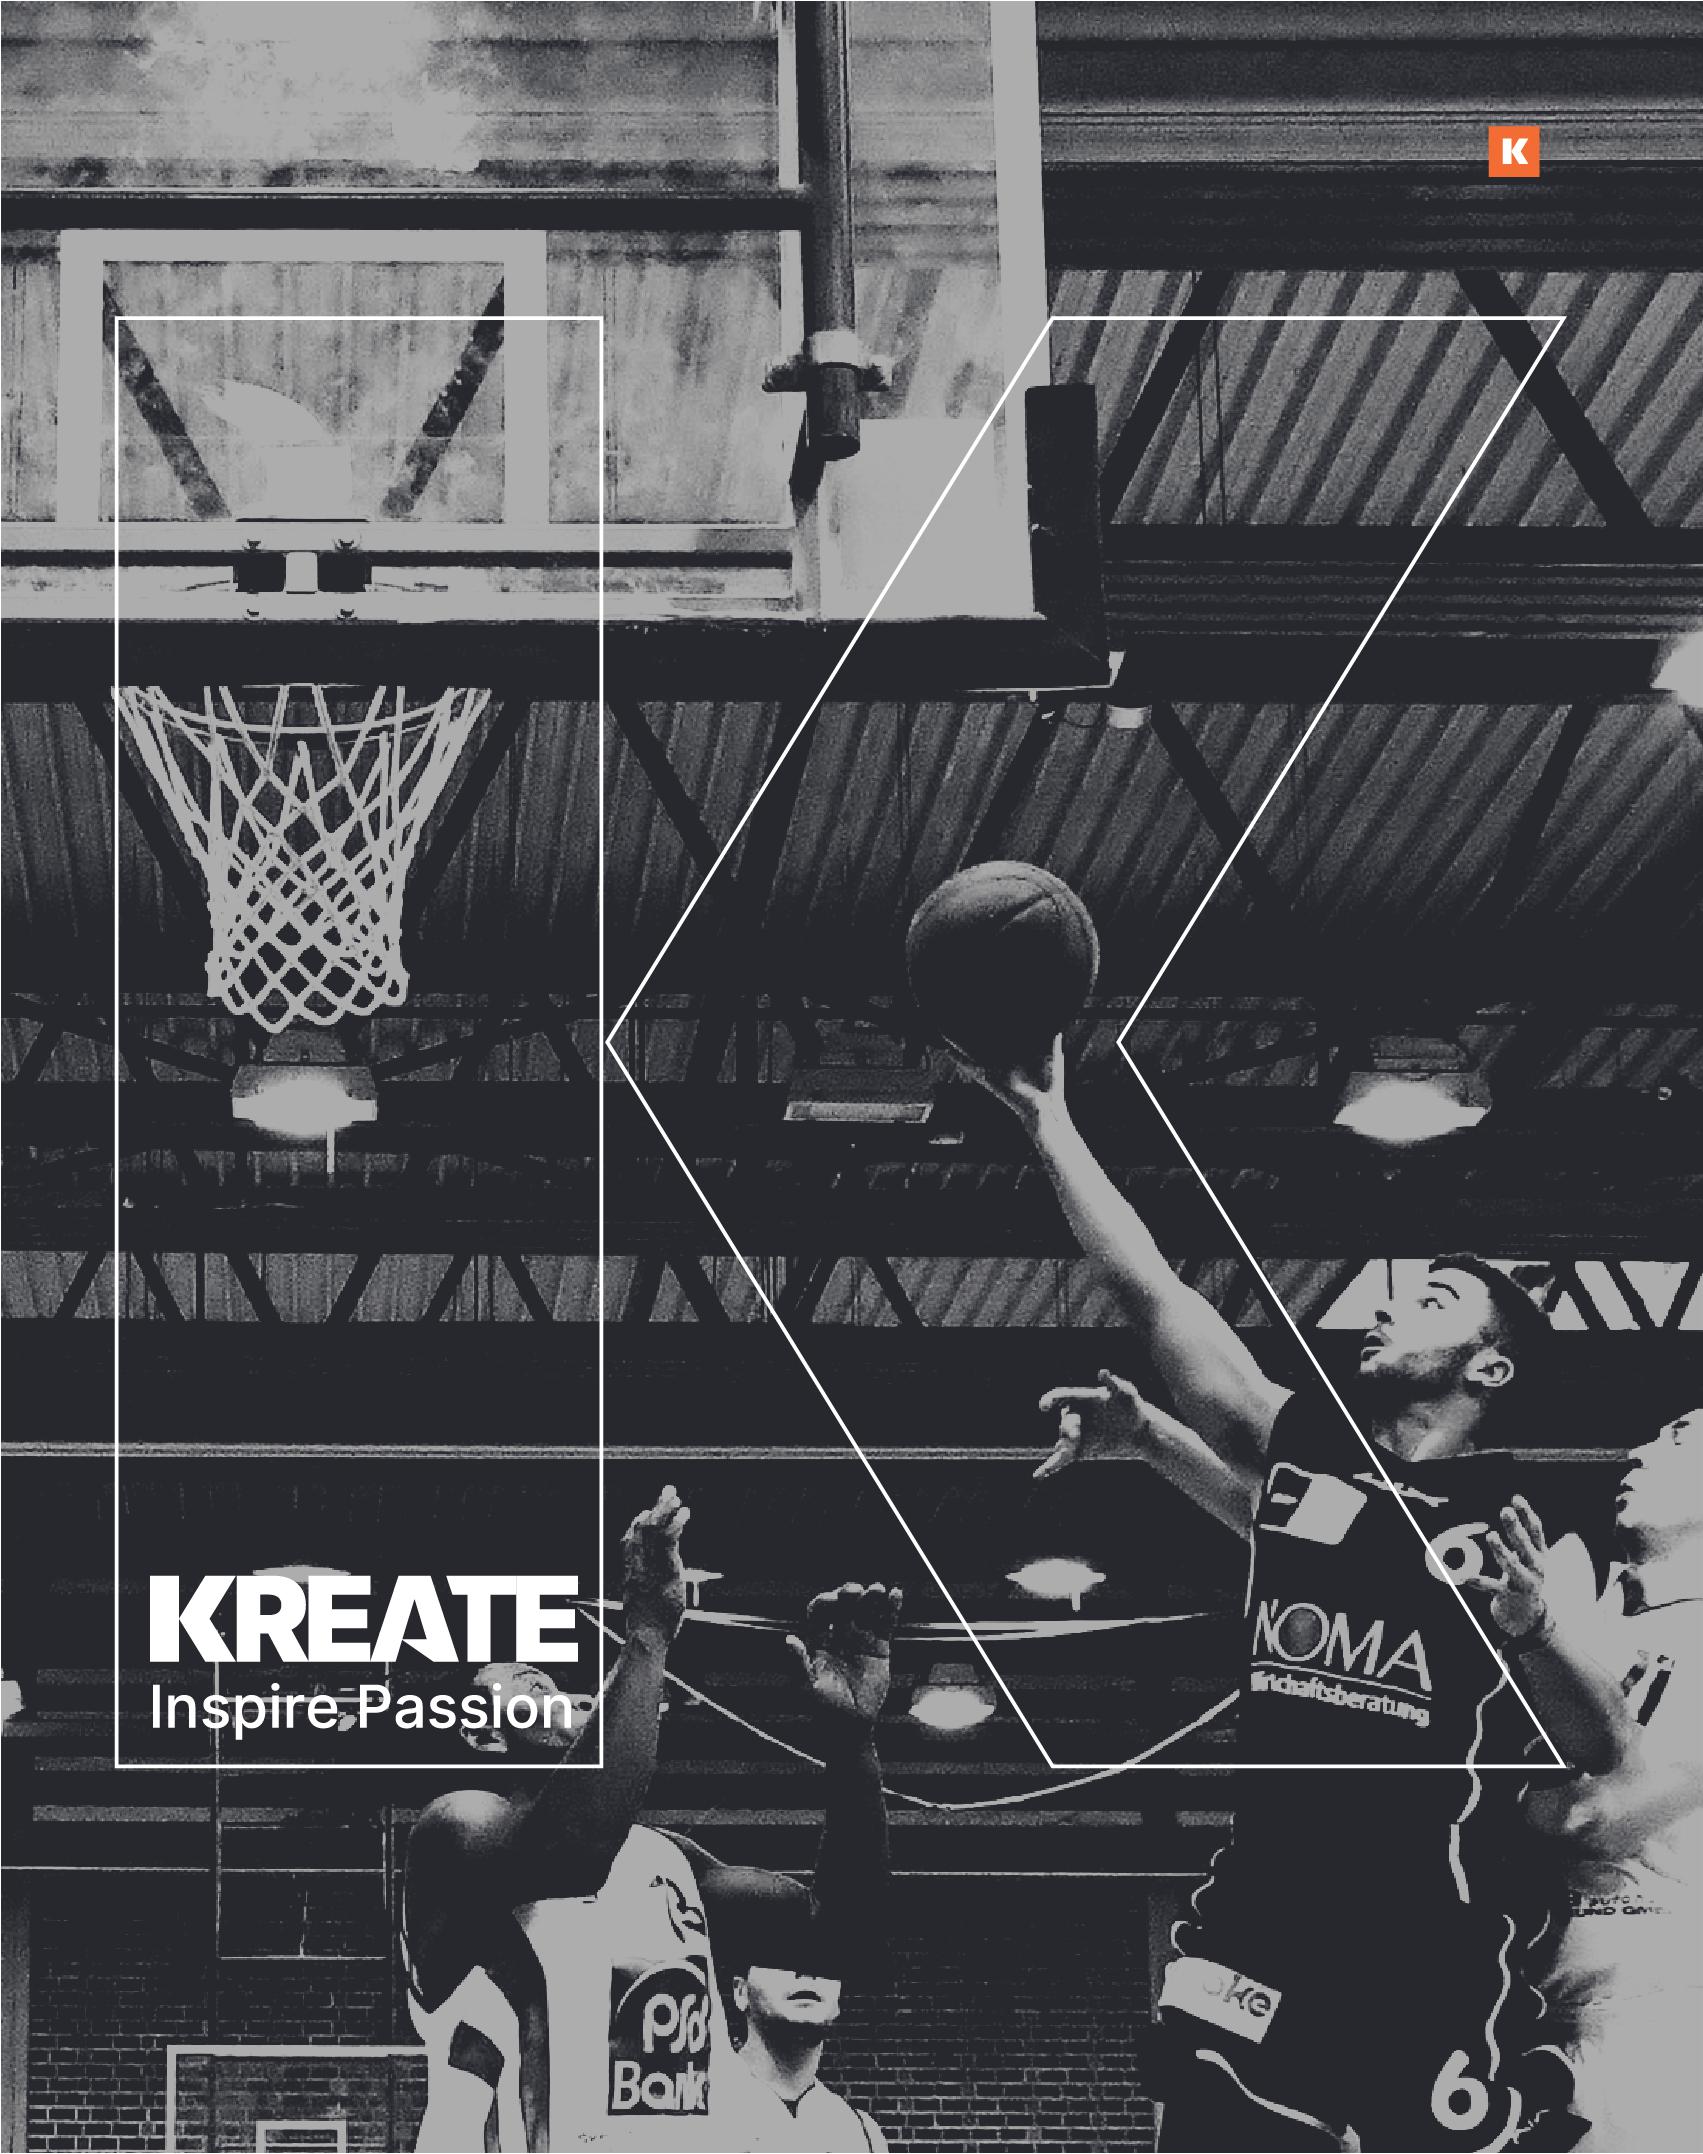 bdsapteltd_projects_kreate_branding-b.png